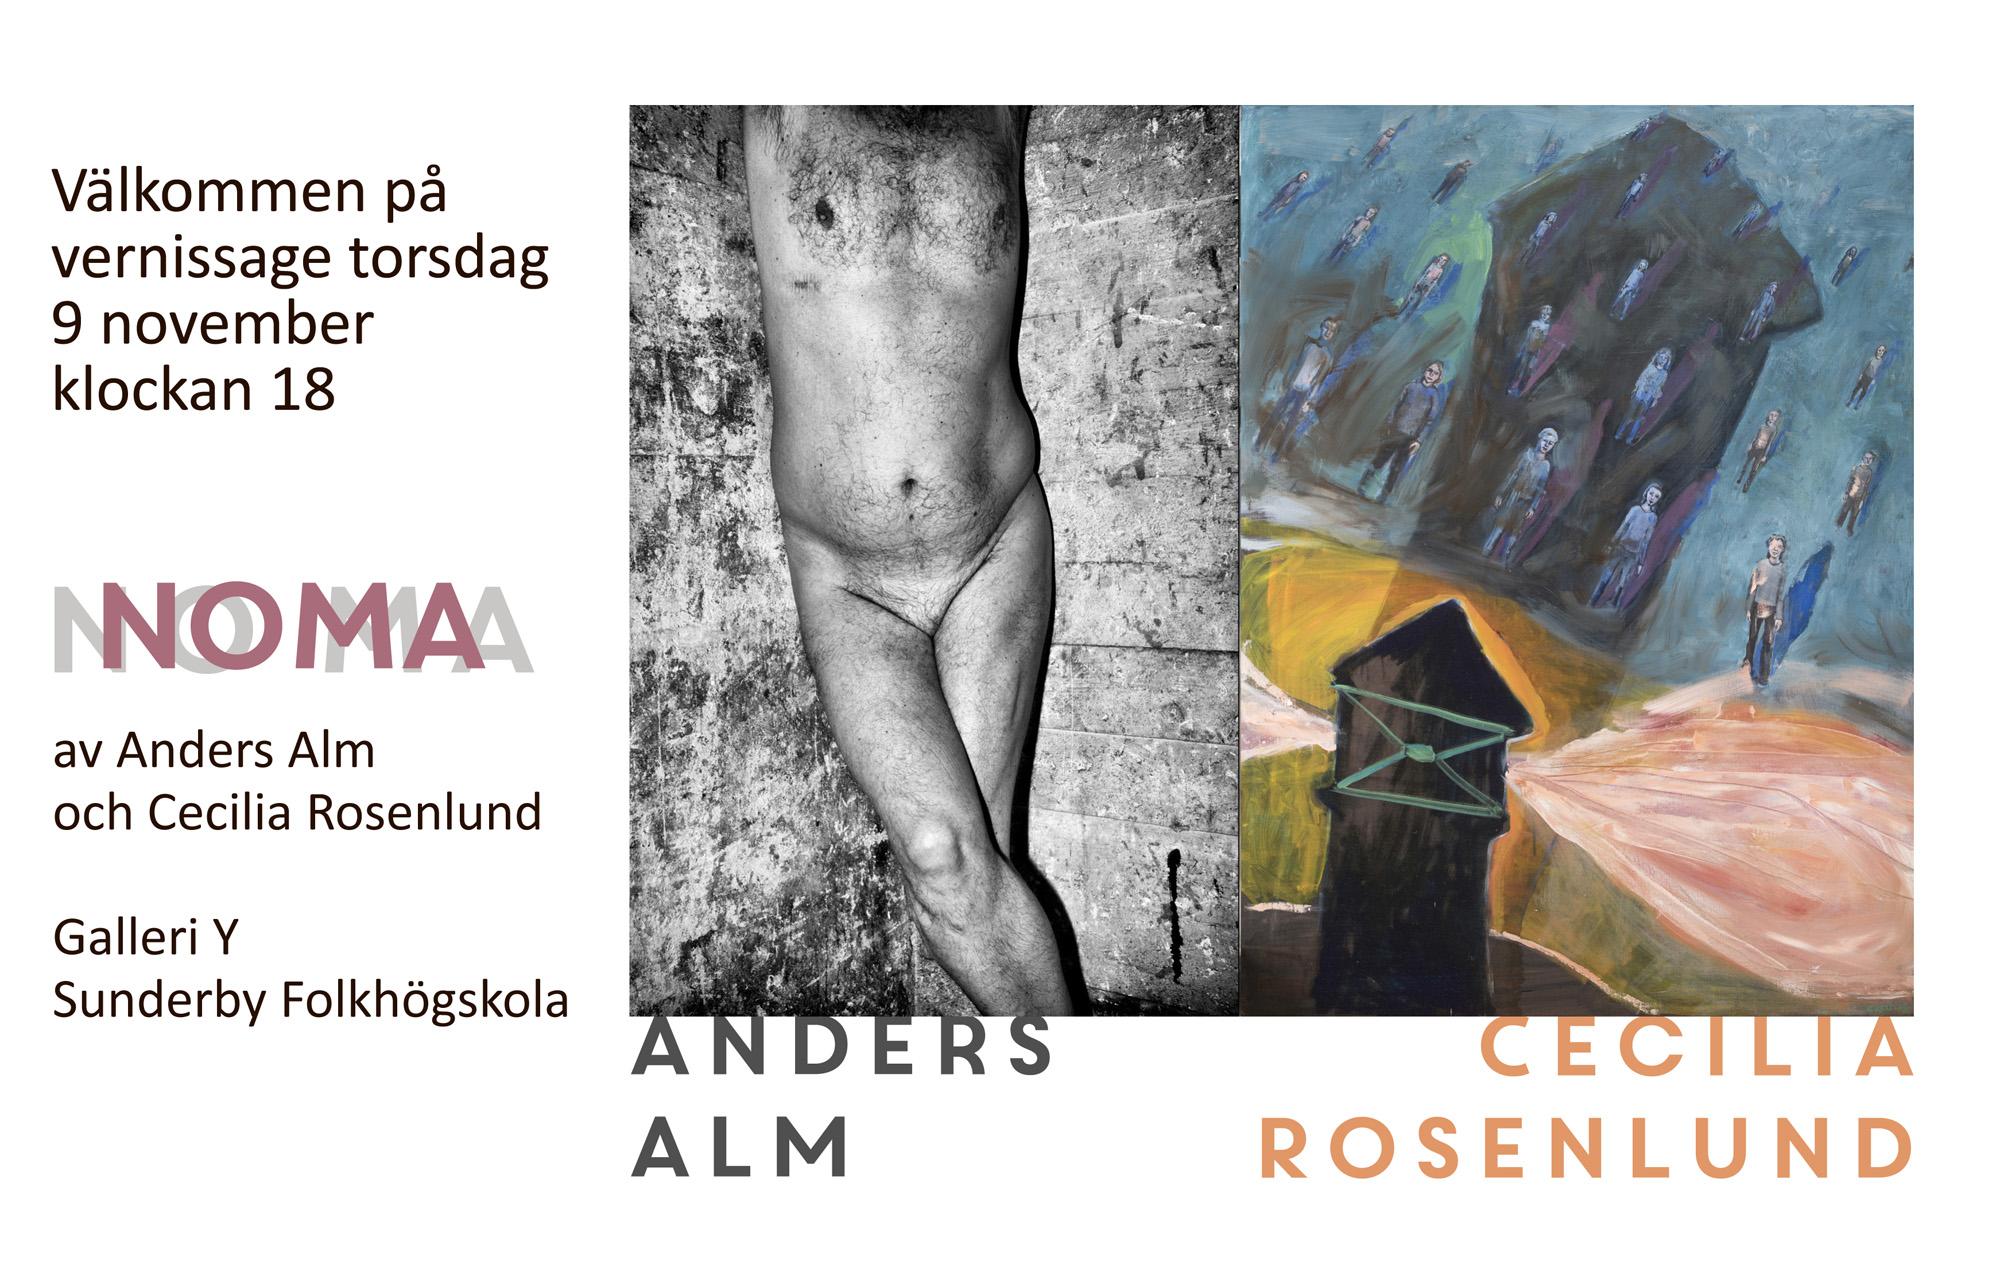 Noma vernissage Anders Alm och Cecilia Rosenlund